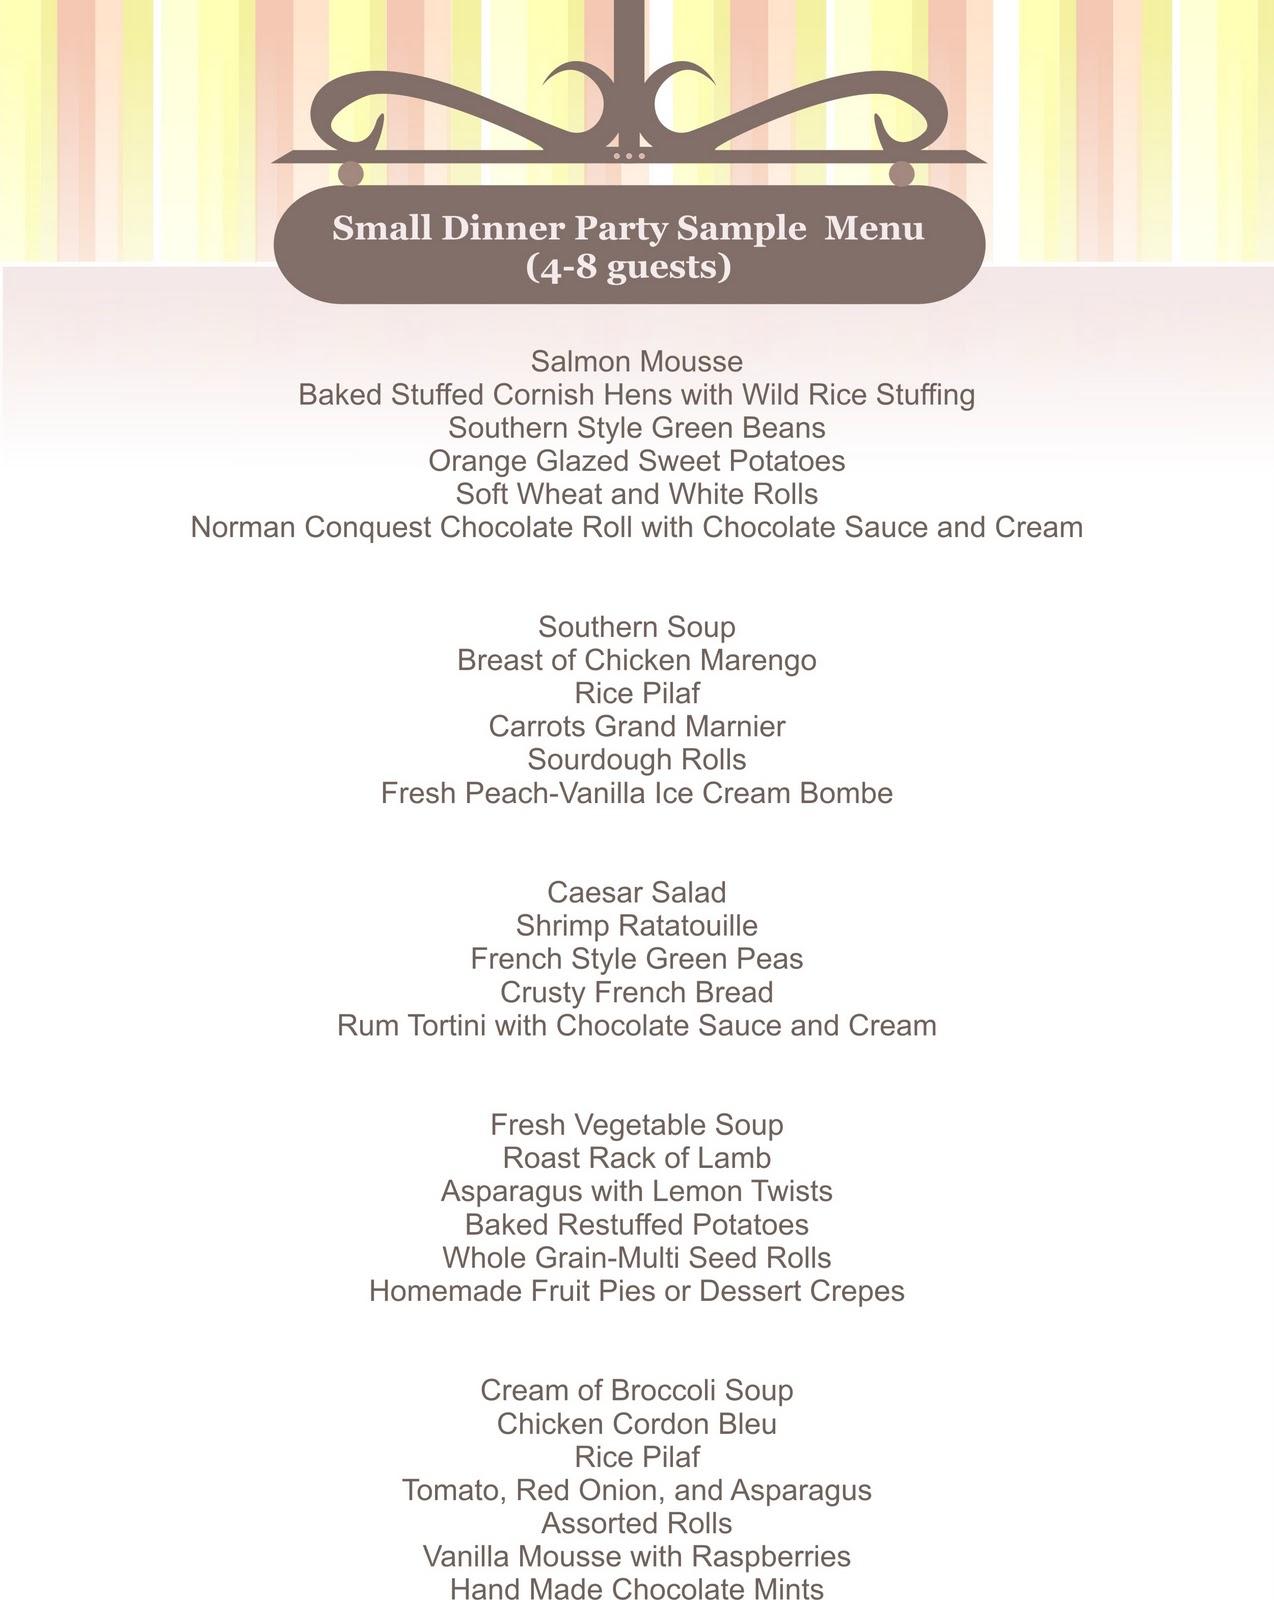 Vegetarian Menu Ideas For Dinner Party Part - 45: Small Dinner Party Sample Menu Large Dinner Parties Sample Menu